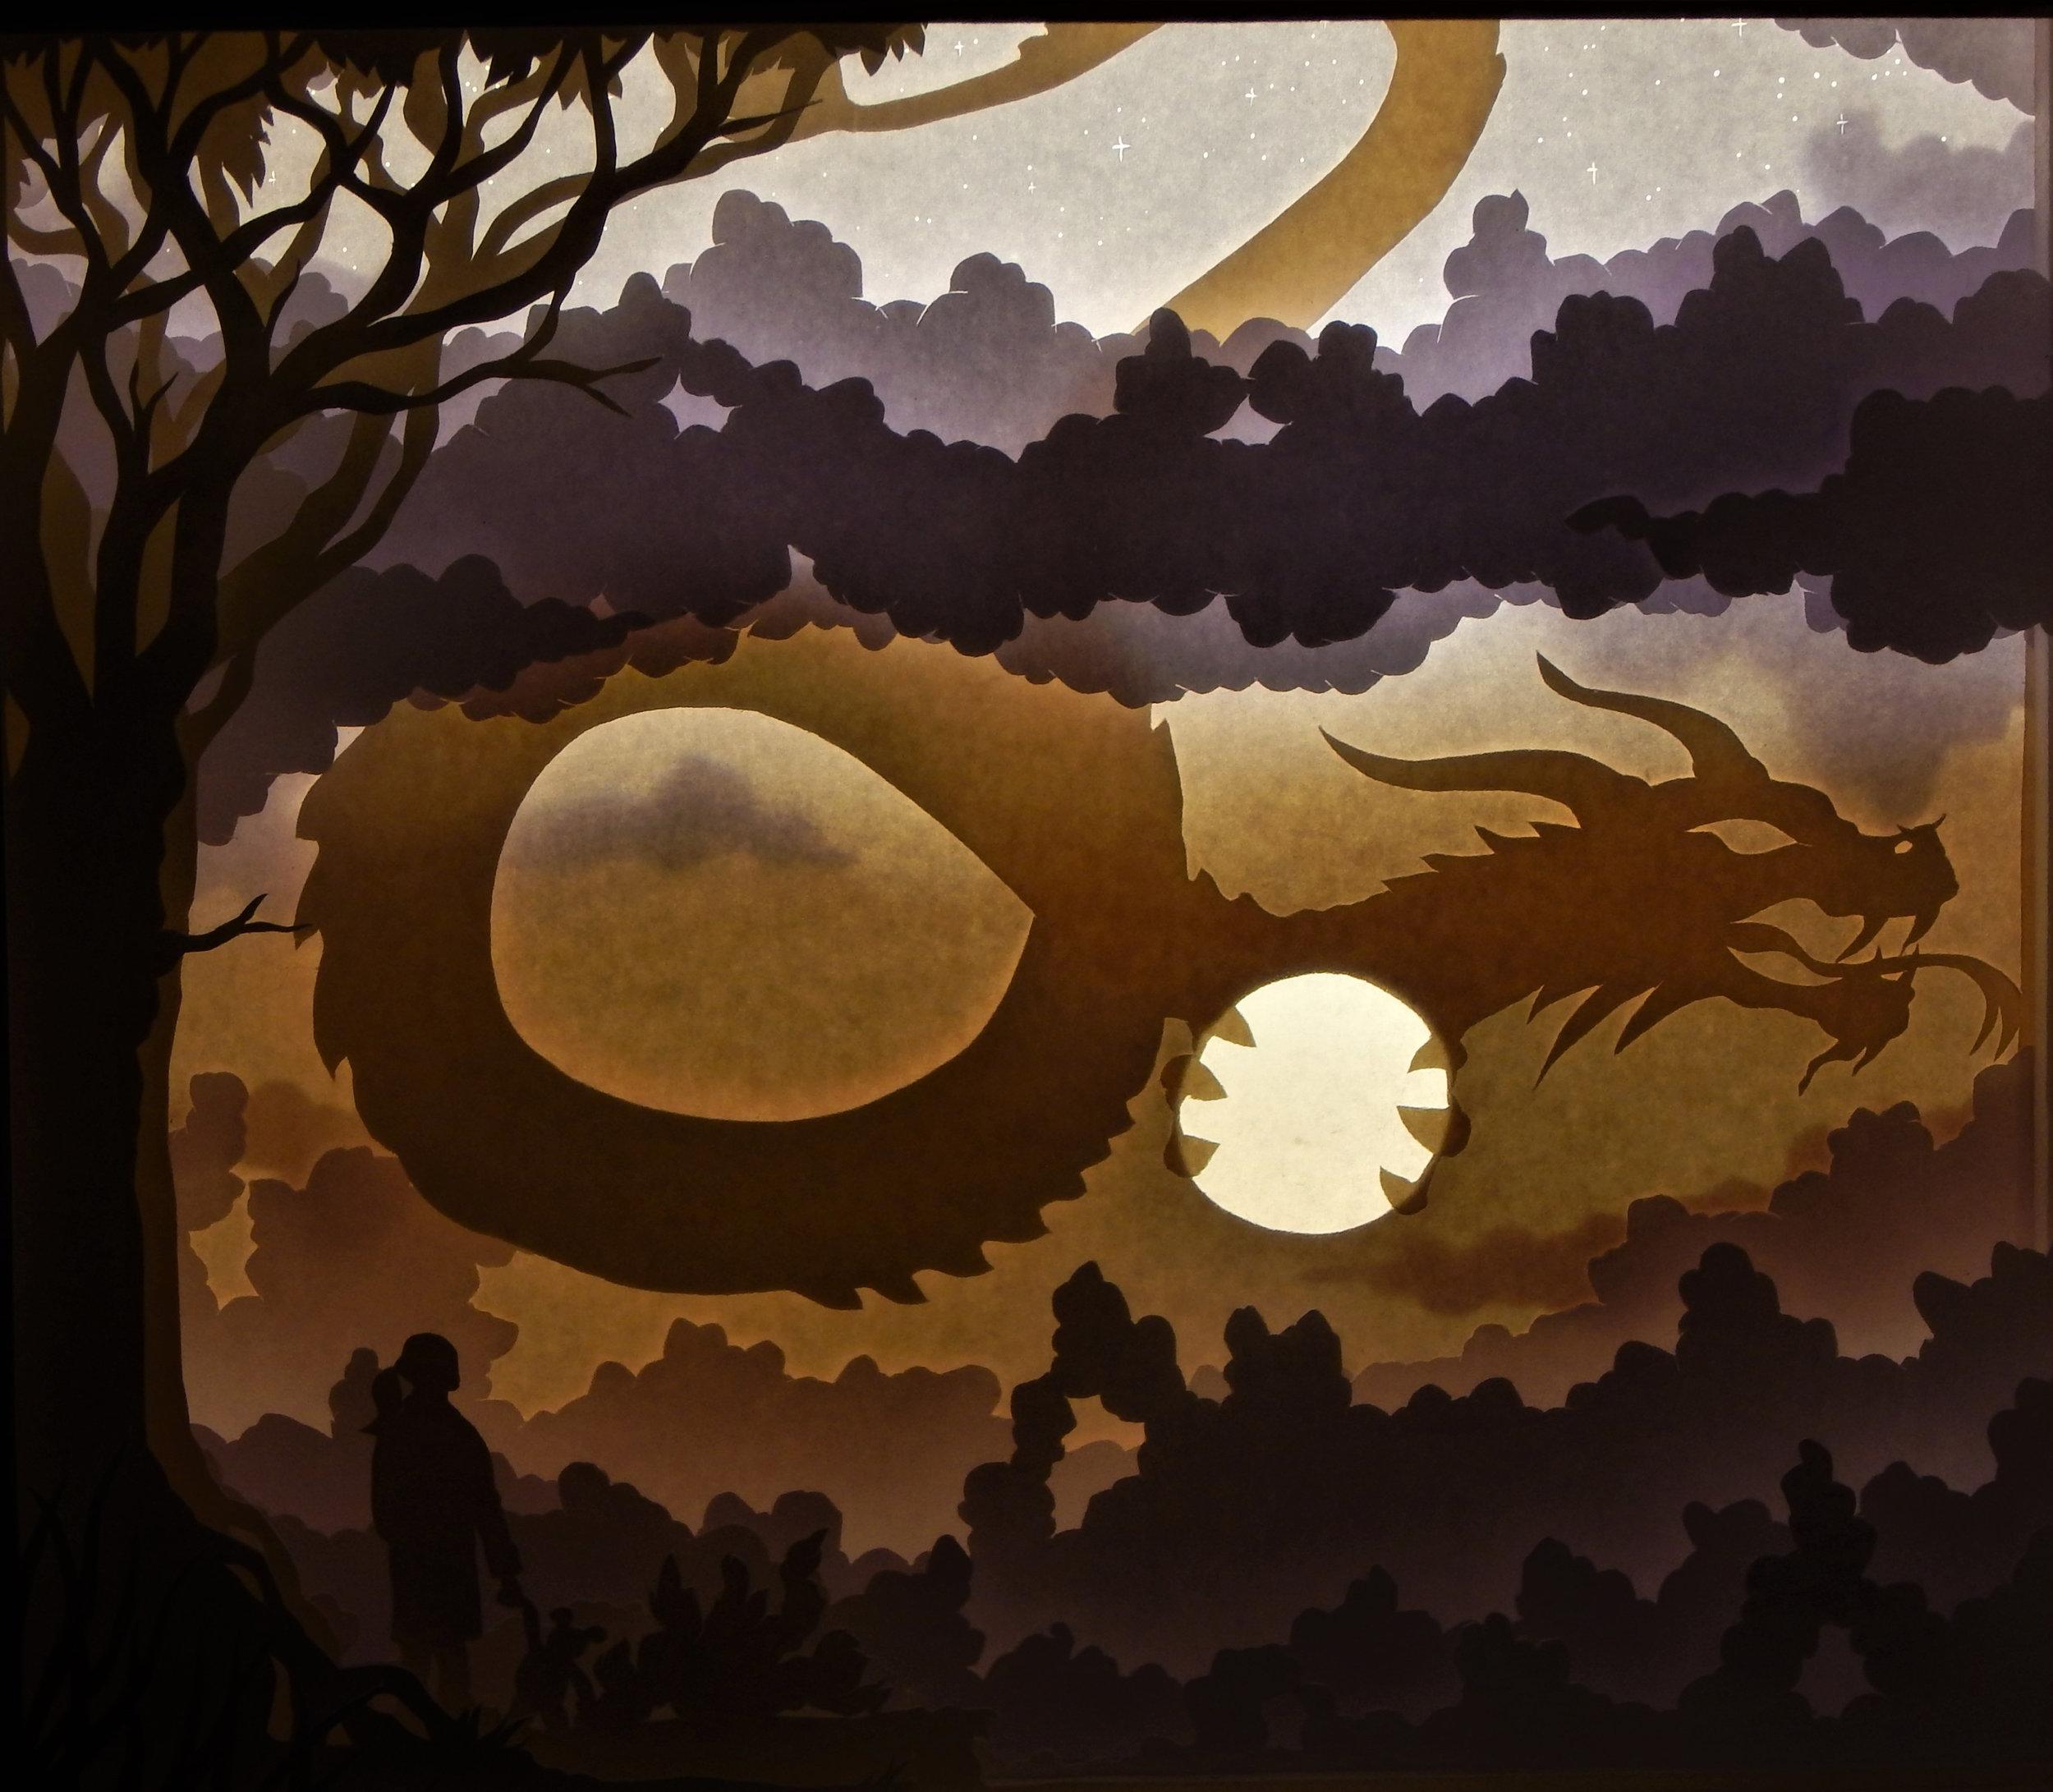 The Night Dragon -